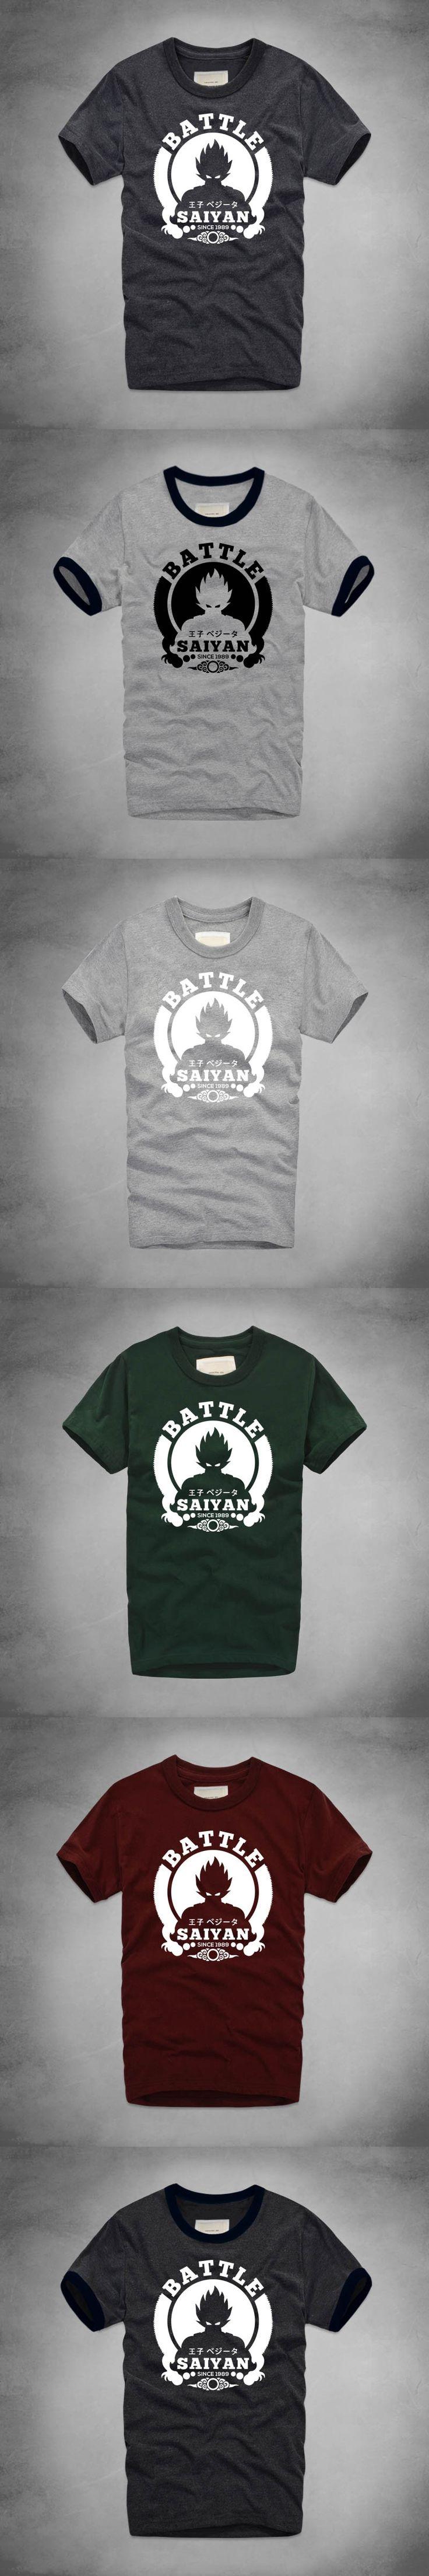 Battle Saiyan Goku T-Shirt Anime Dragon Ball Funny Print T-shirts Summer Casual Men Tee Shirts Thick Cotton Short Sleeve T Shirt